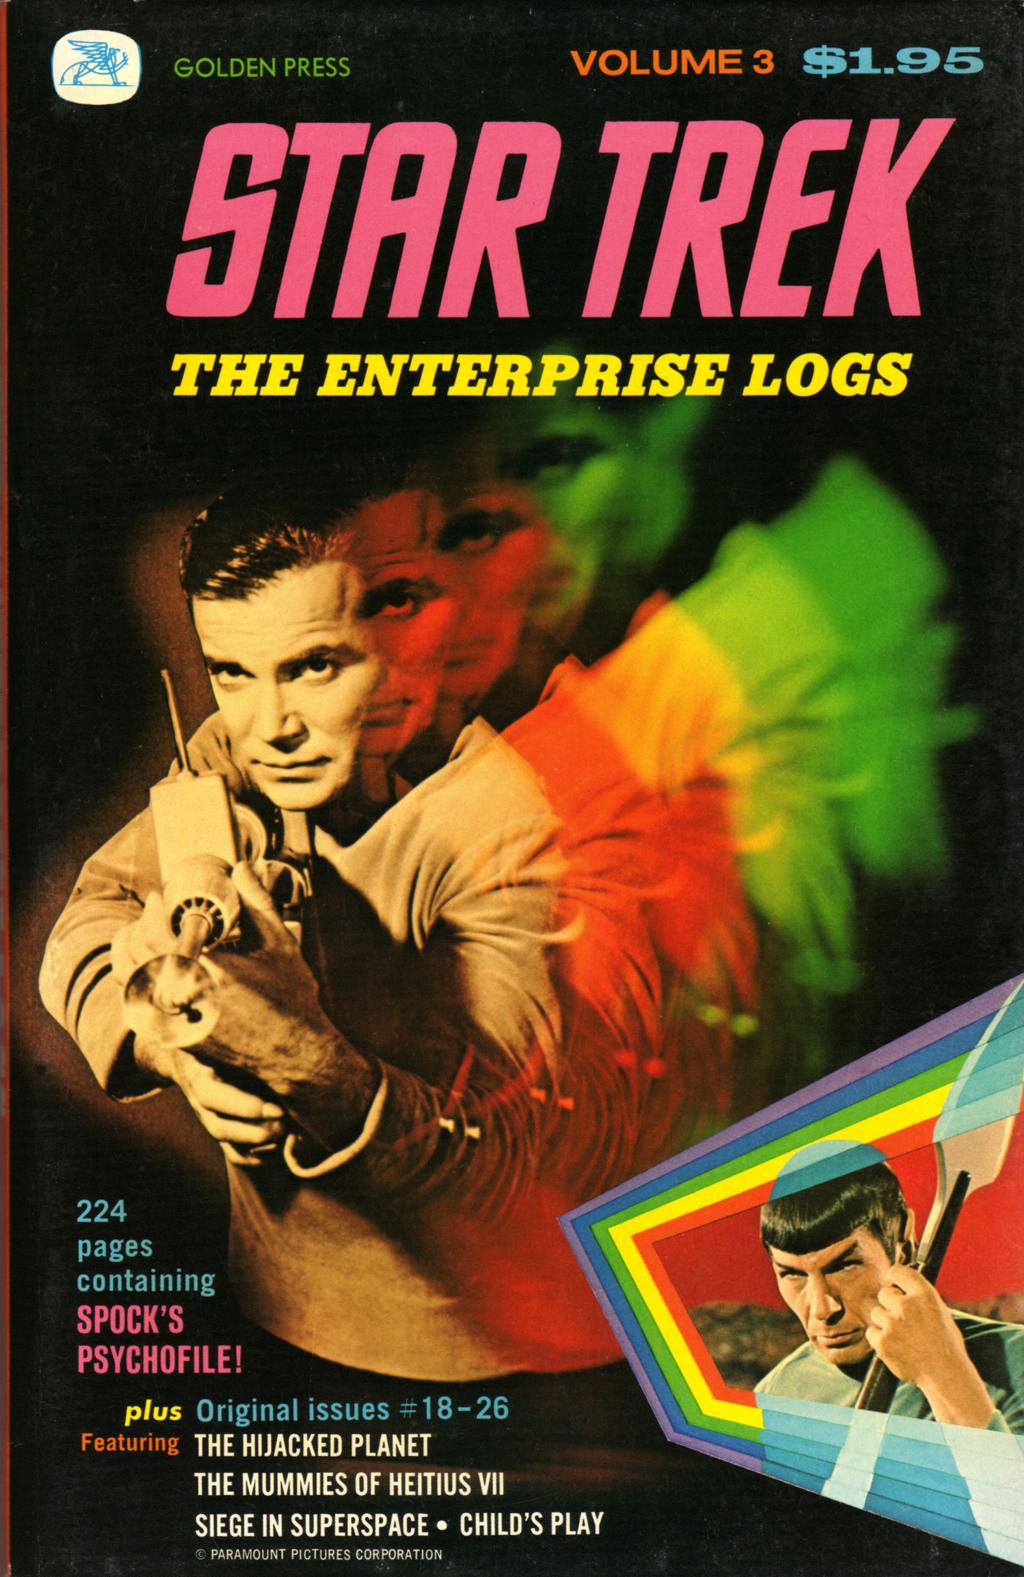 The Enterprise Logs, Volume 3